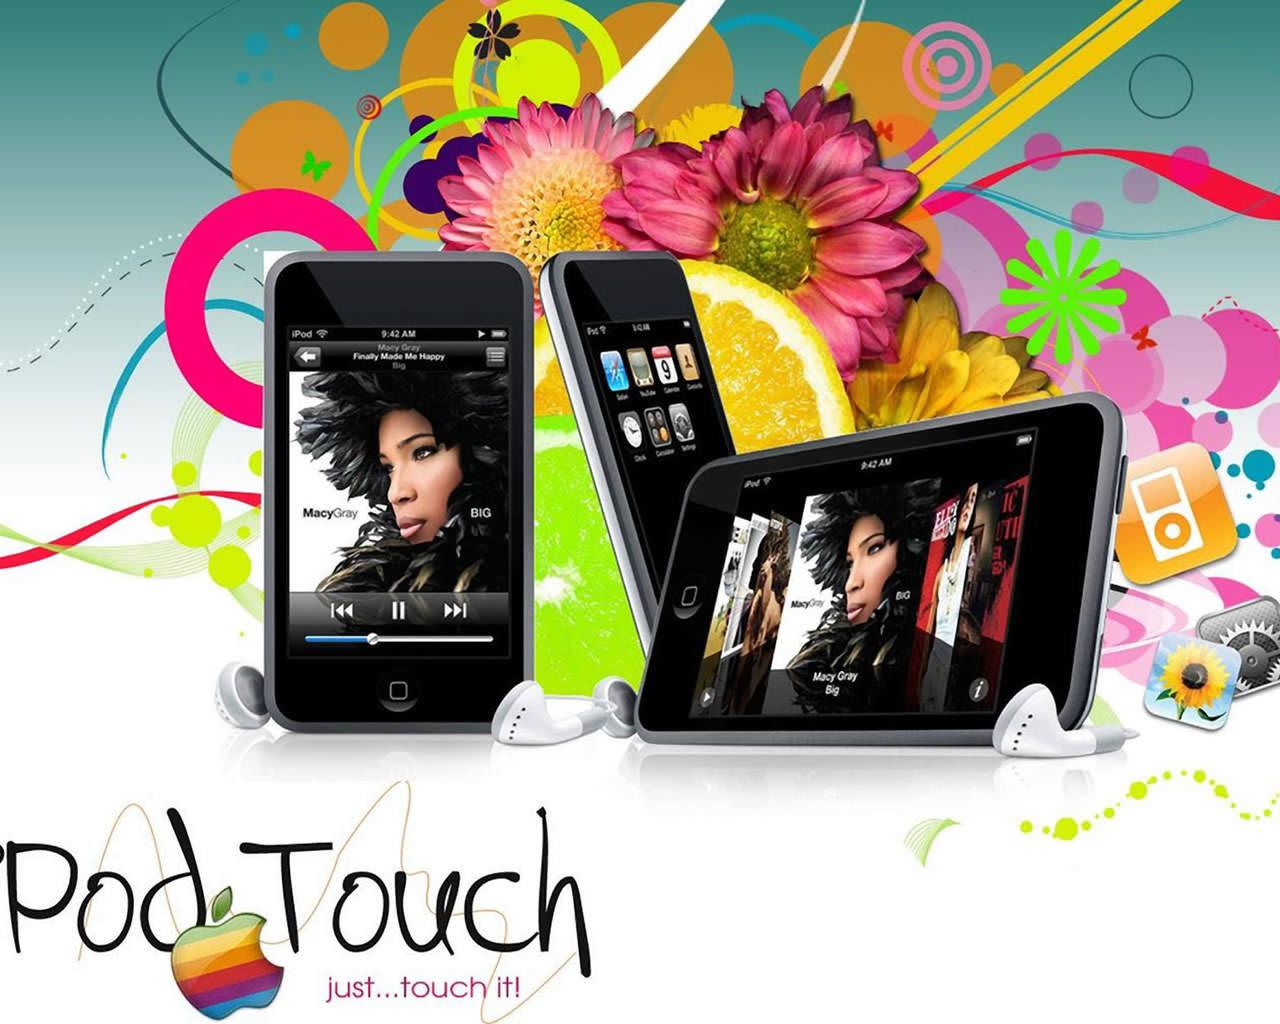 Ipod 5 Wallpaper   FREE DOWNLOAD HD WALLPAPERS 1280x1024